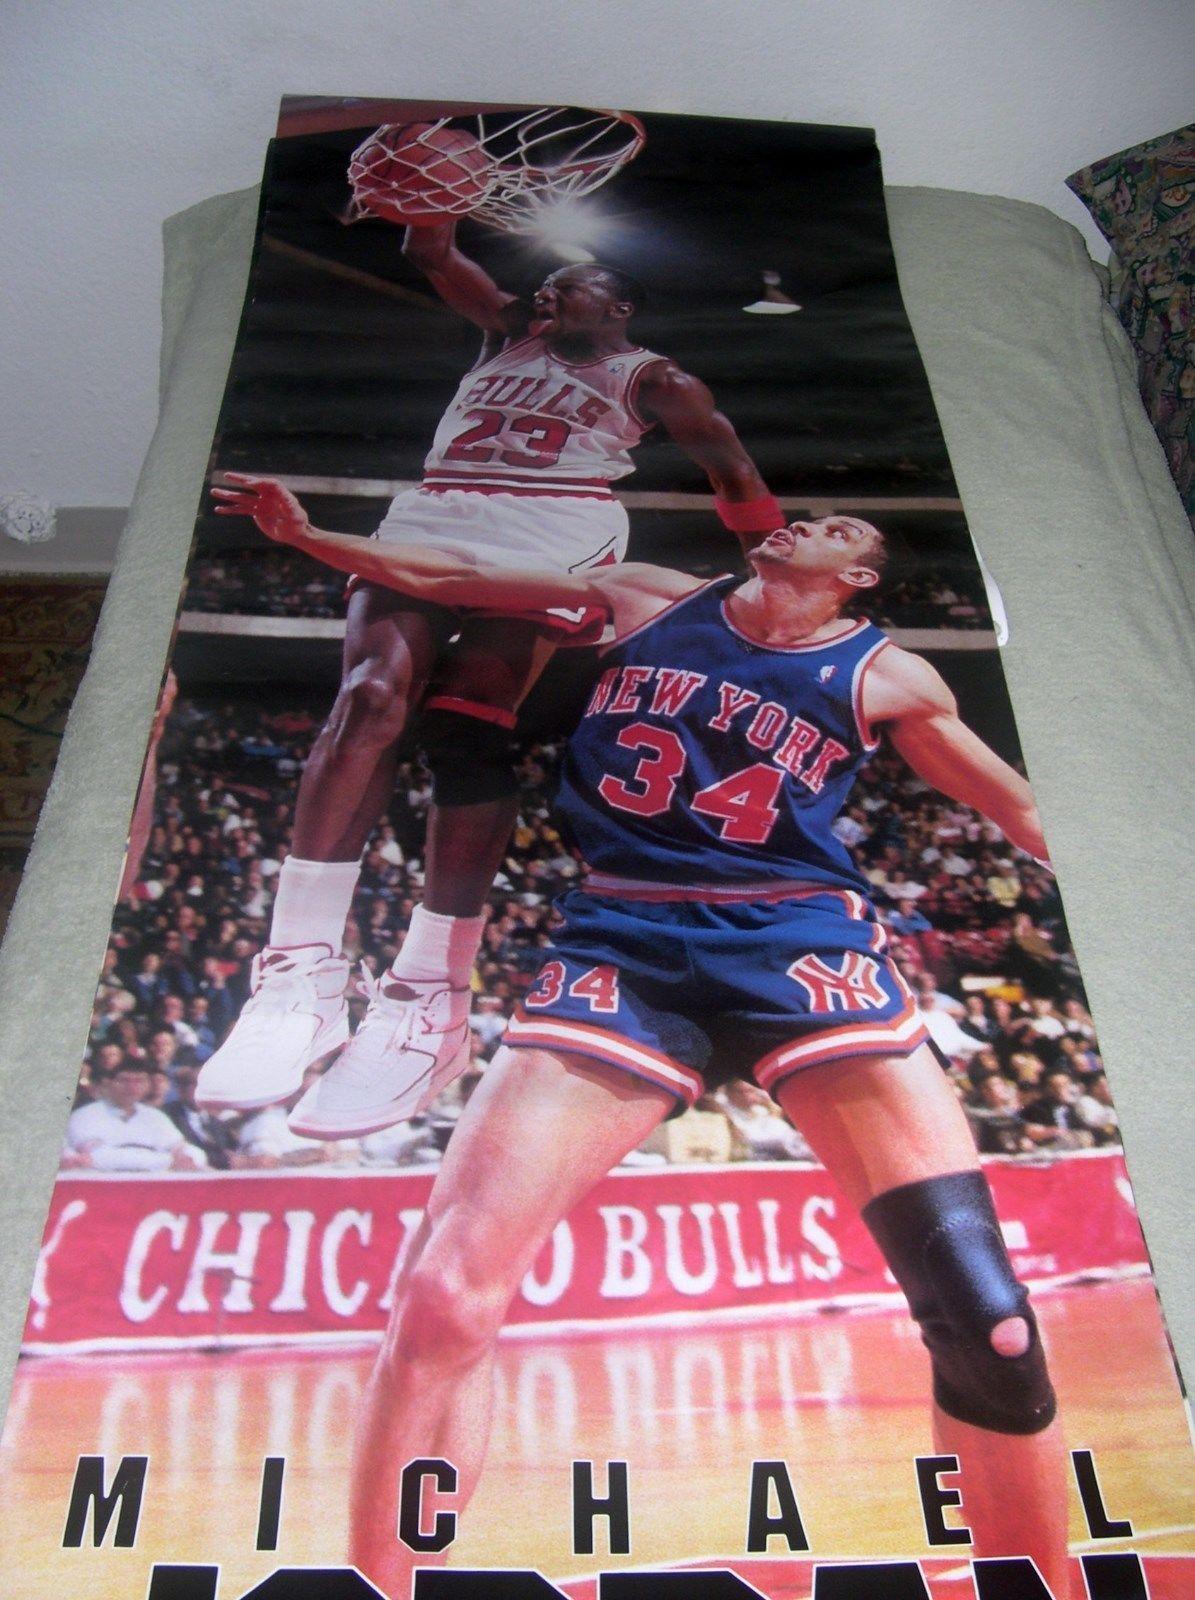 Vintage Michael Jordan Poster Nba Basketball Memorabilia Sport Chicago Bull Essay On